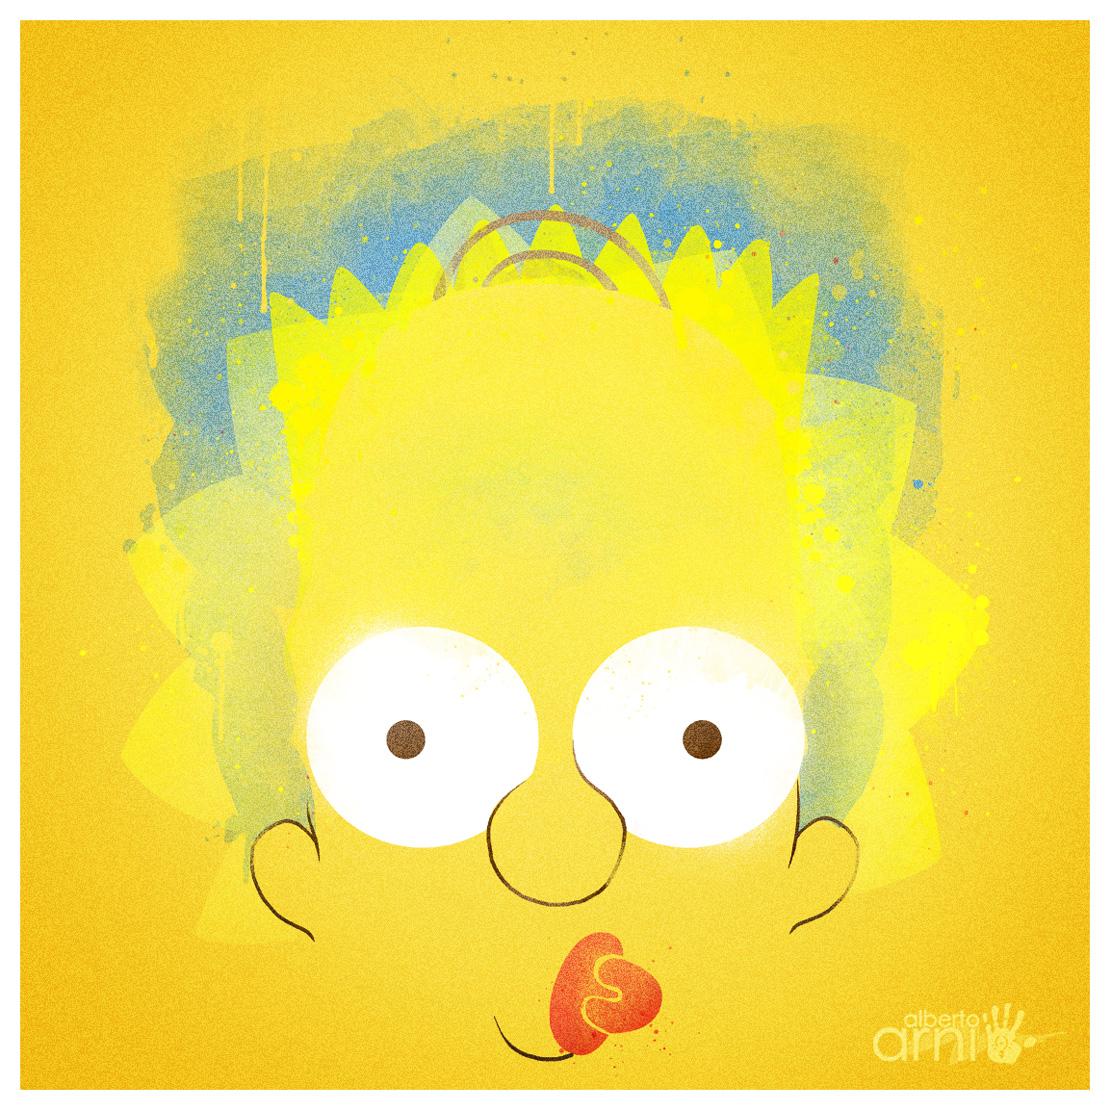 Simpsons by AlbertoArni